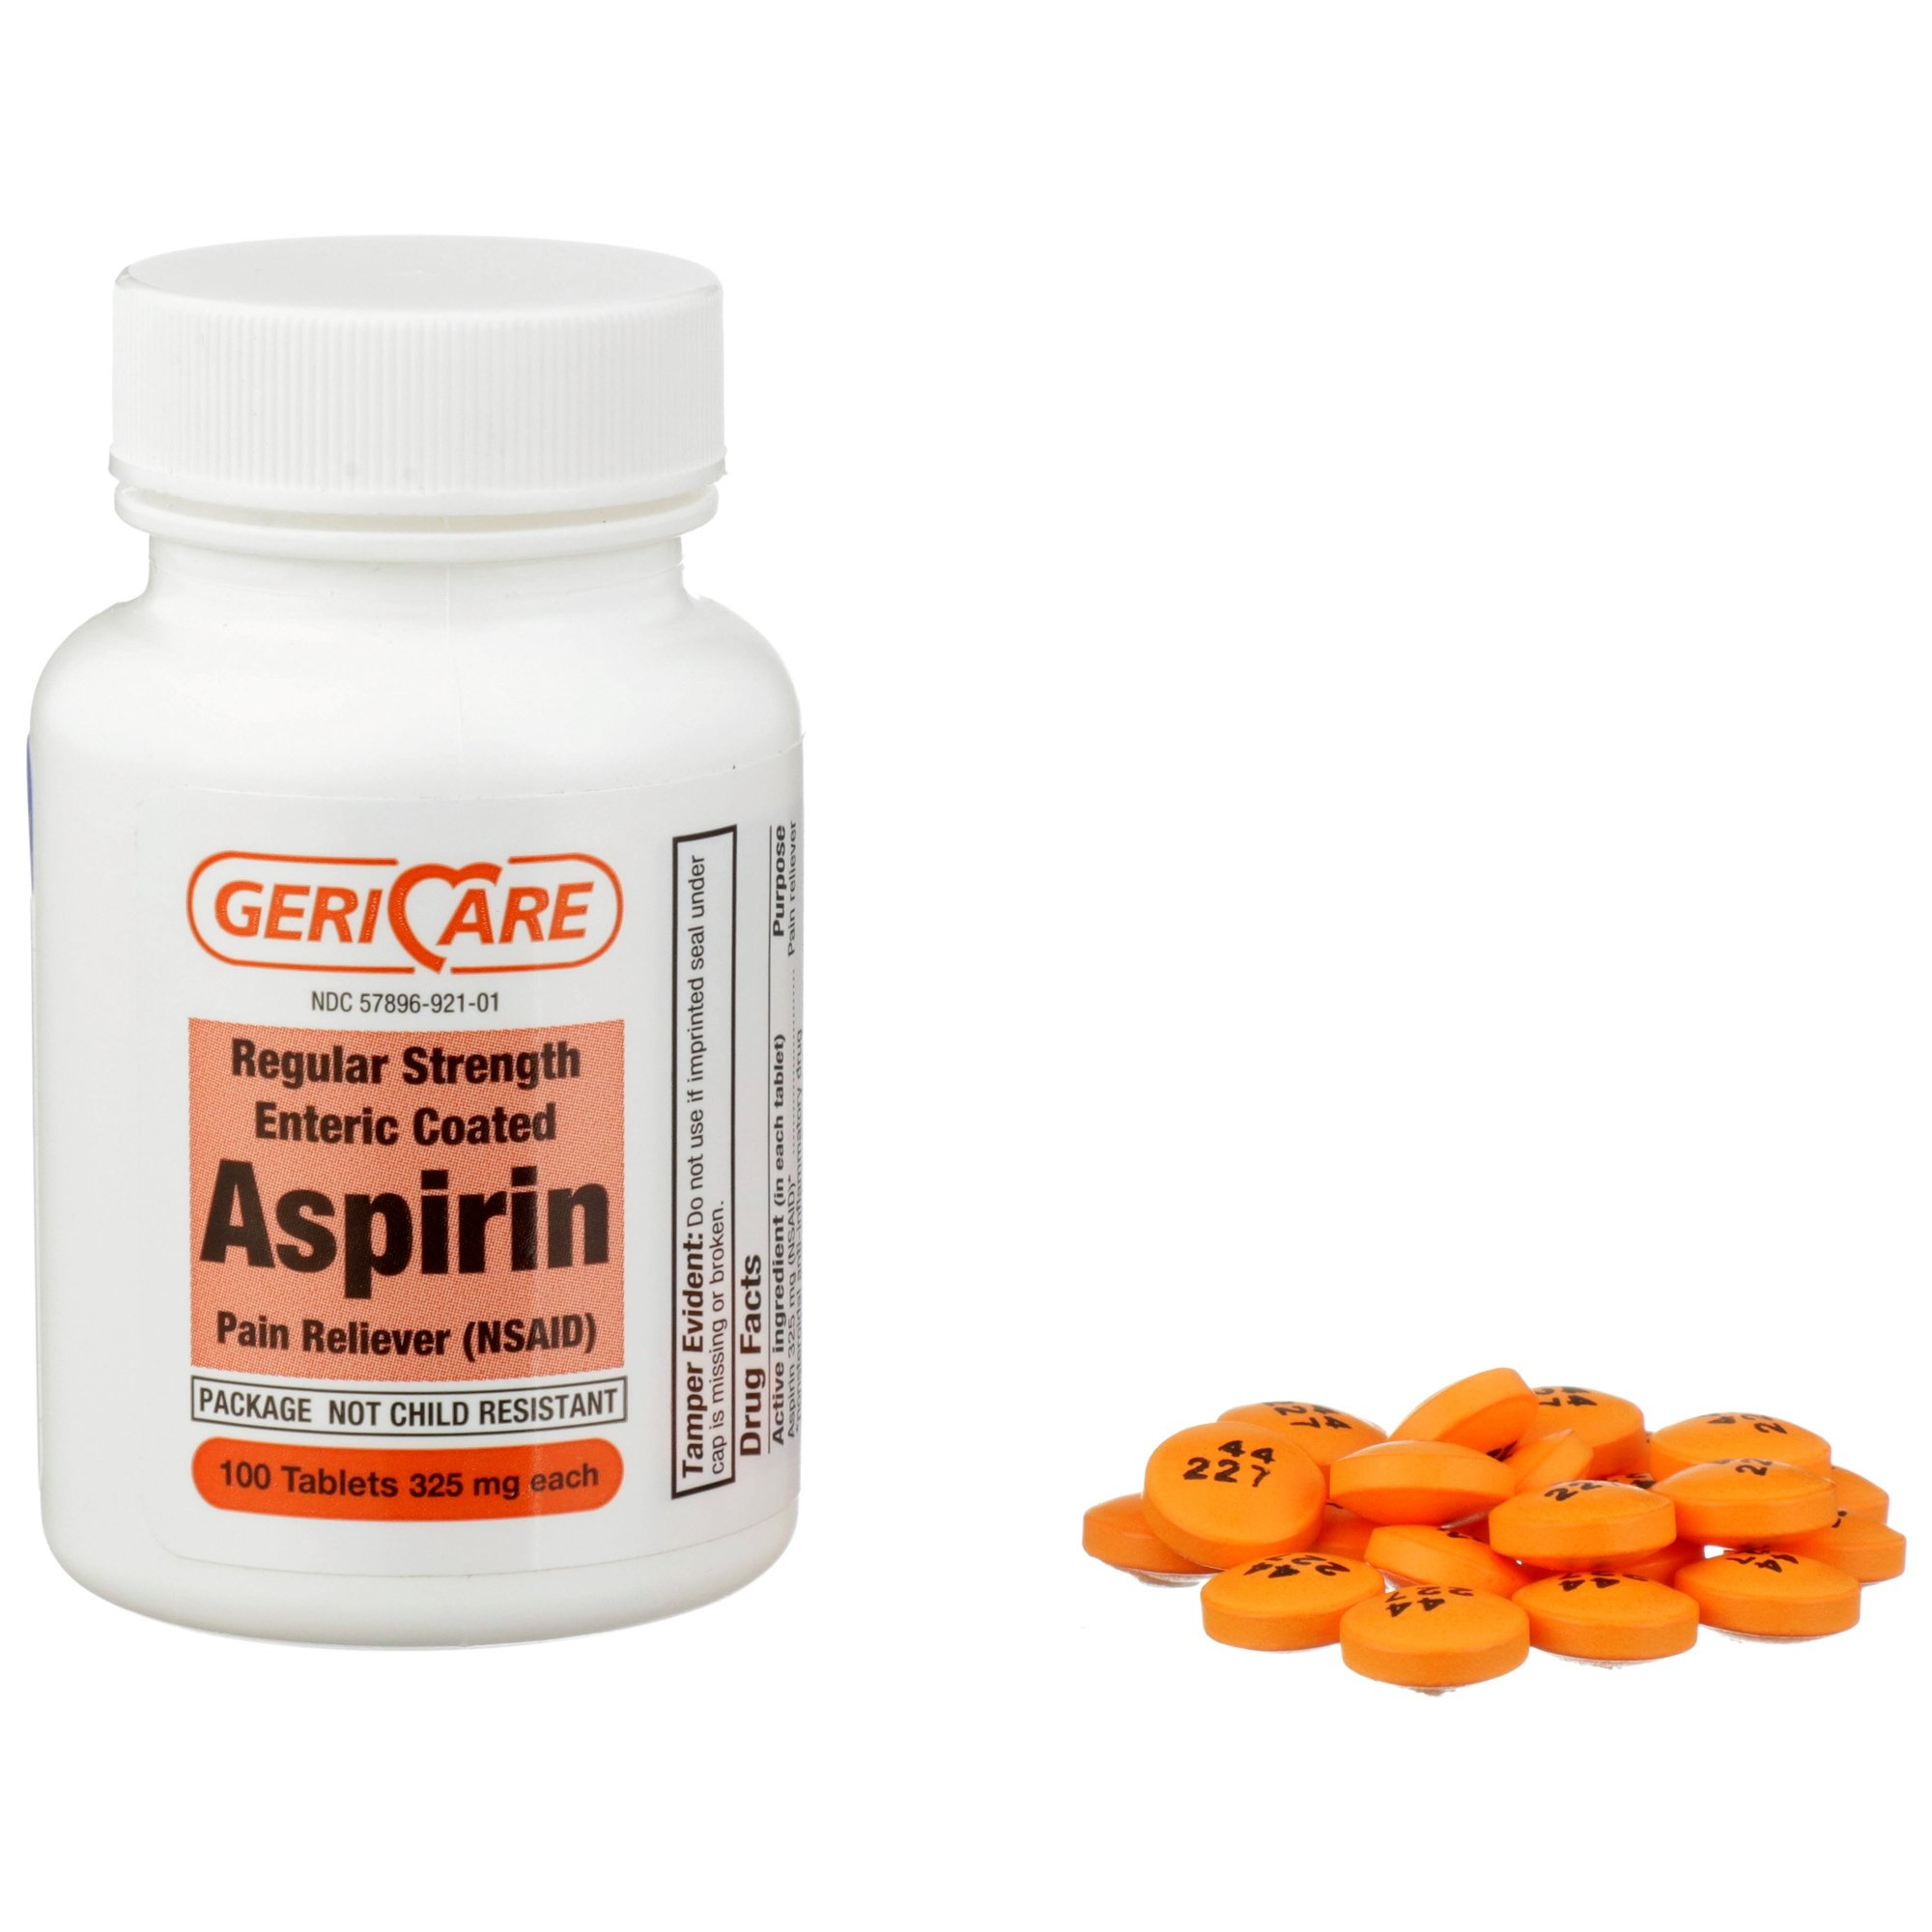 Geri-Care Regular Strength Enteric Coated Aspirin, 325 mg, 60-921-01, 100 Tablets - 1 Bottle